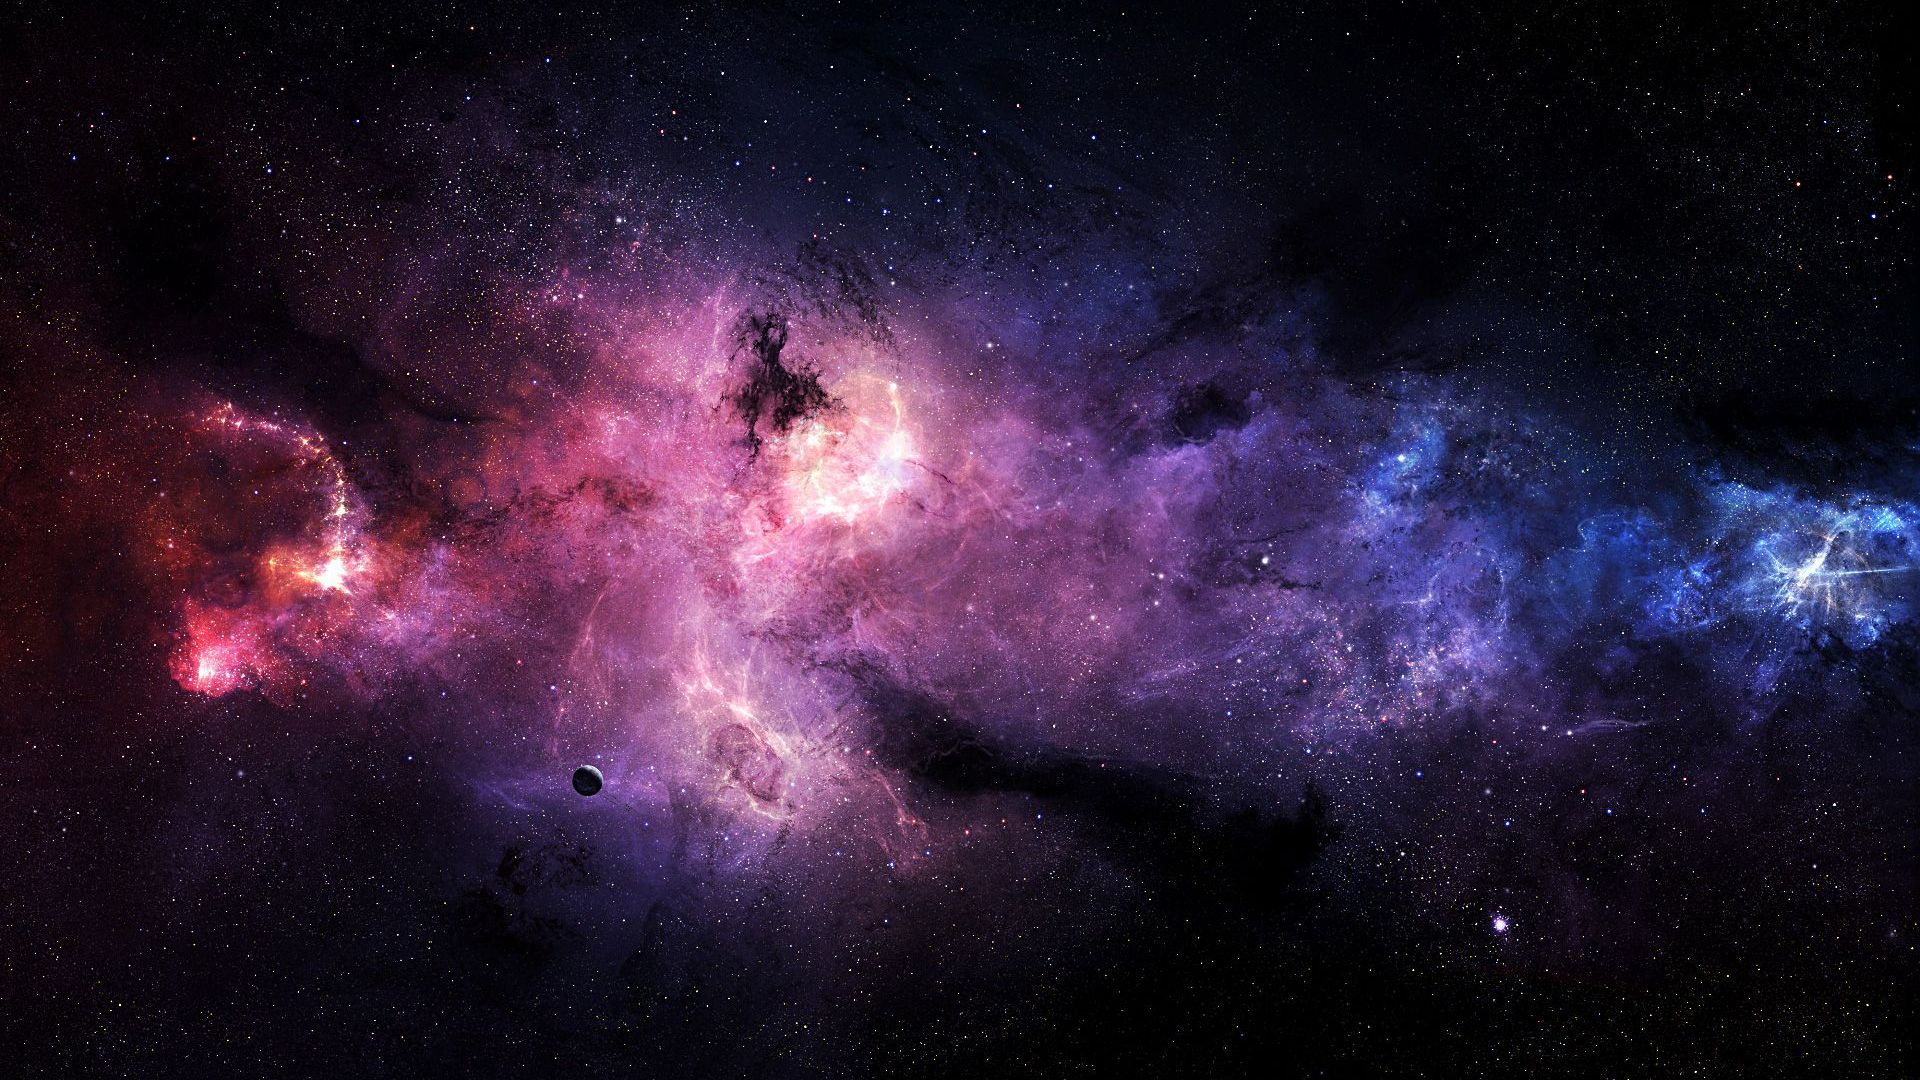 Galaxy Hd Wallpapers 1080p 75 Images: Galaxy Wallpaper 1080p